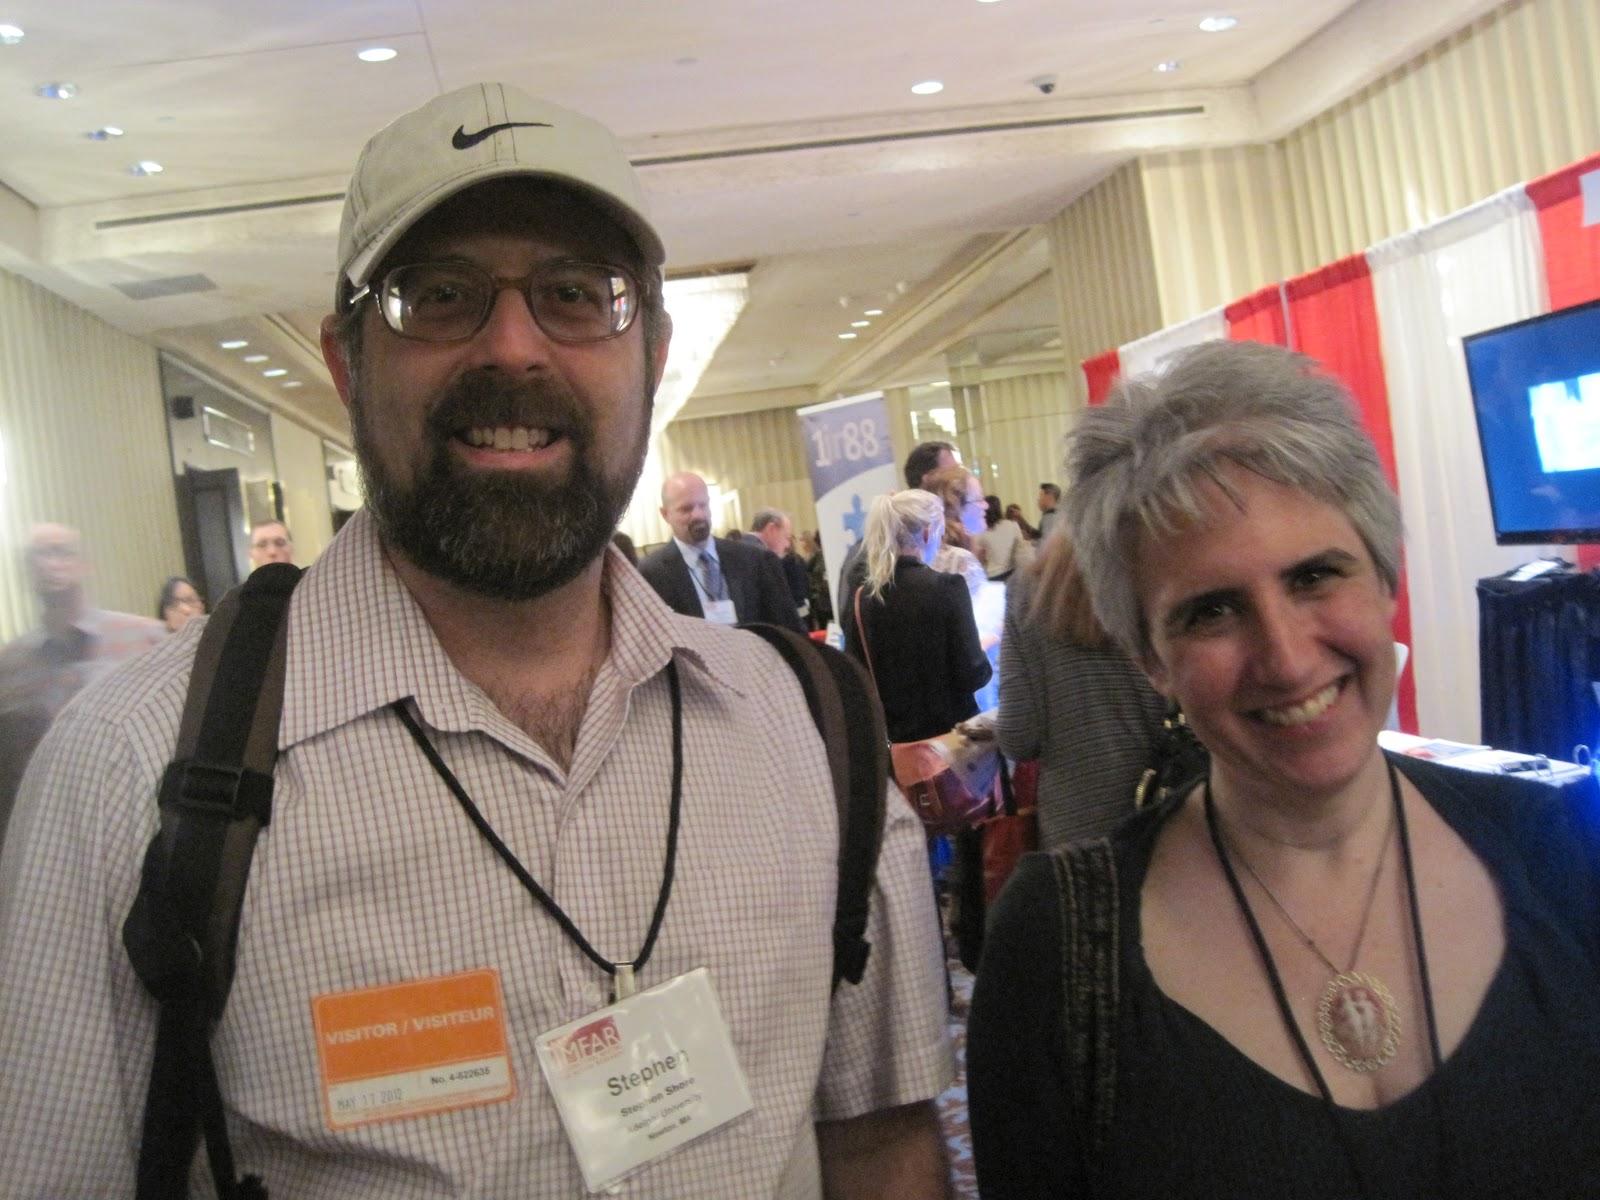 John Elder Robison At Imfar On Autism >> Thinking Person S Guide To Autism Imfar 2012 One Autistic